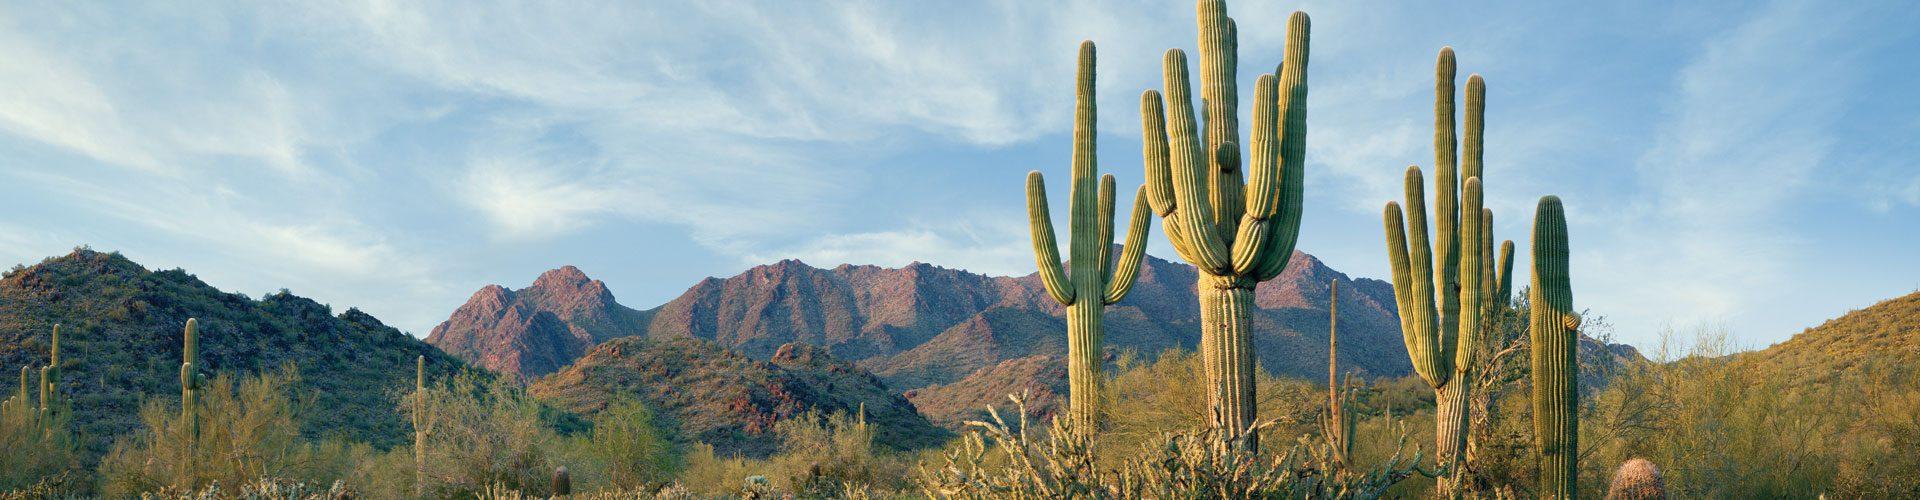 Saguaro Kaktee in Arizona